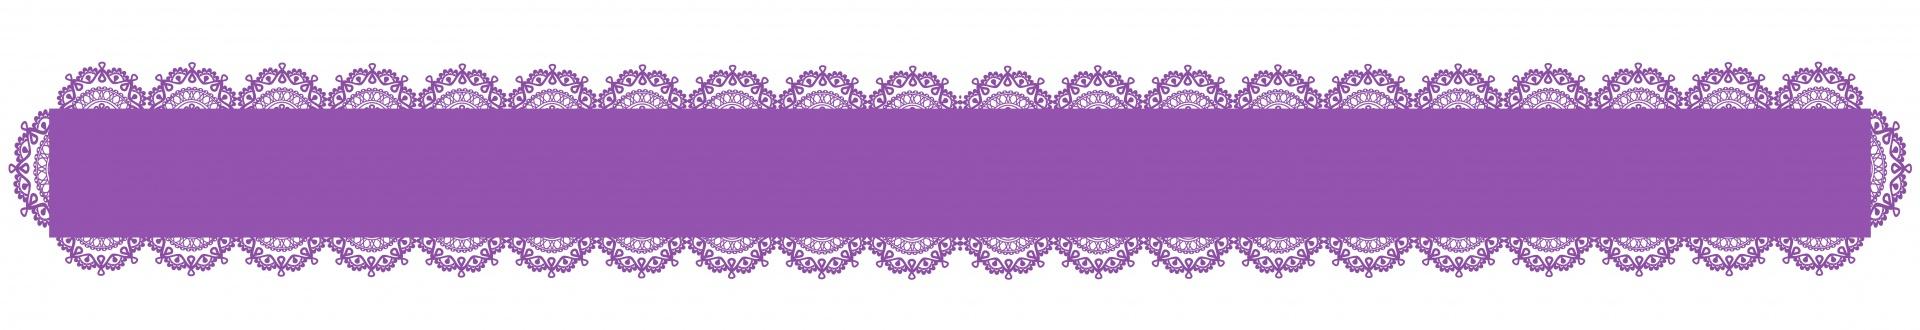 Decorative Purple Ribbon Free Stock Photo - Public Domain Pictures